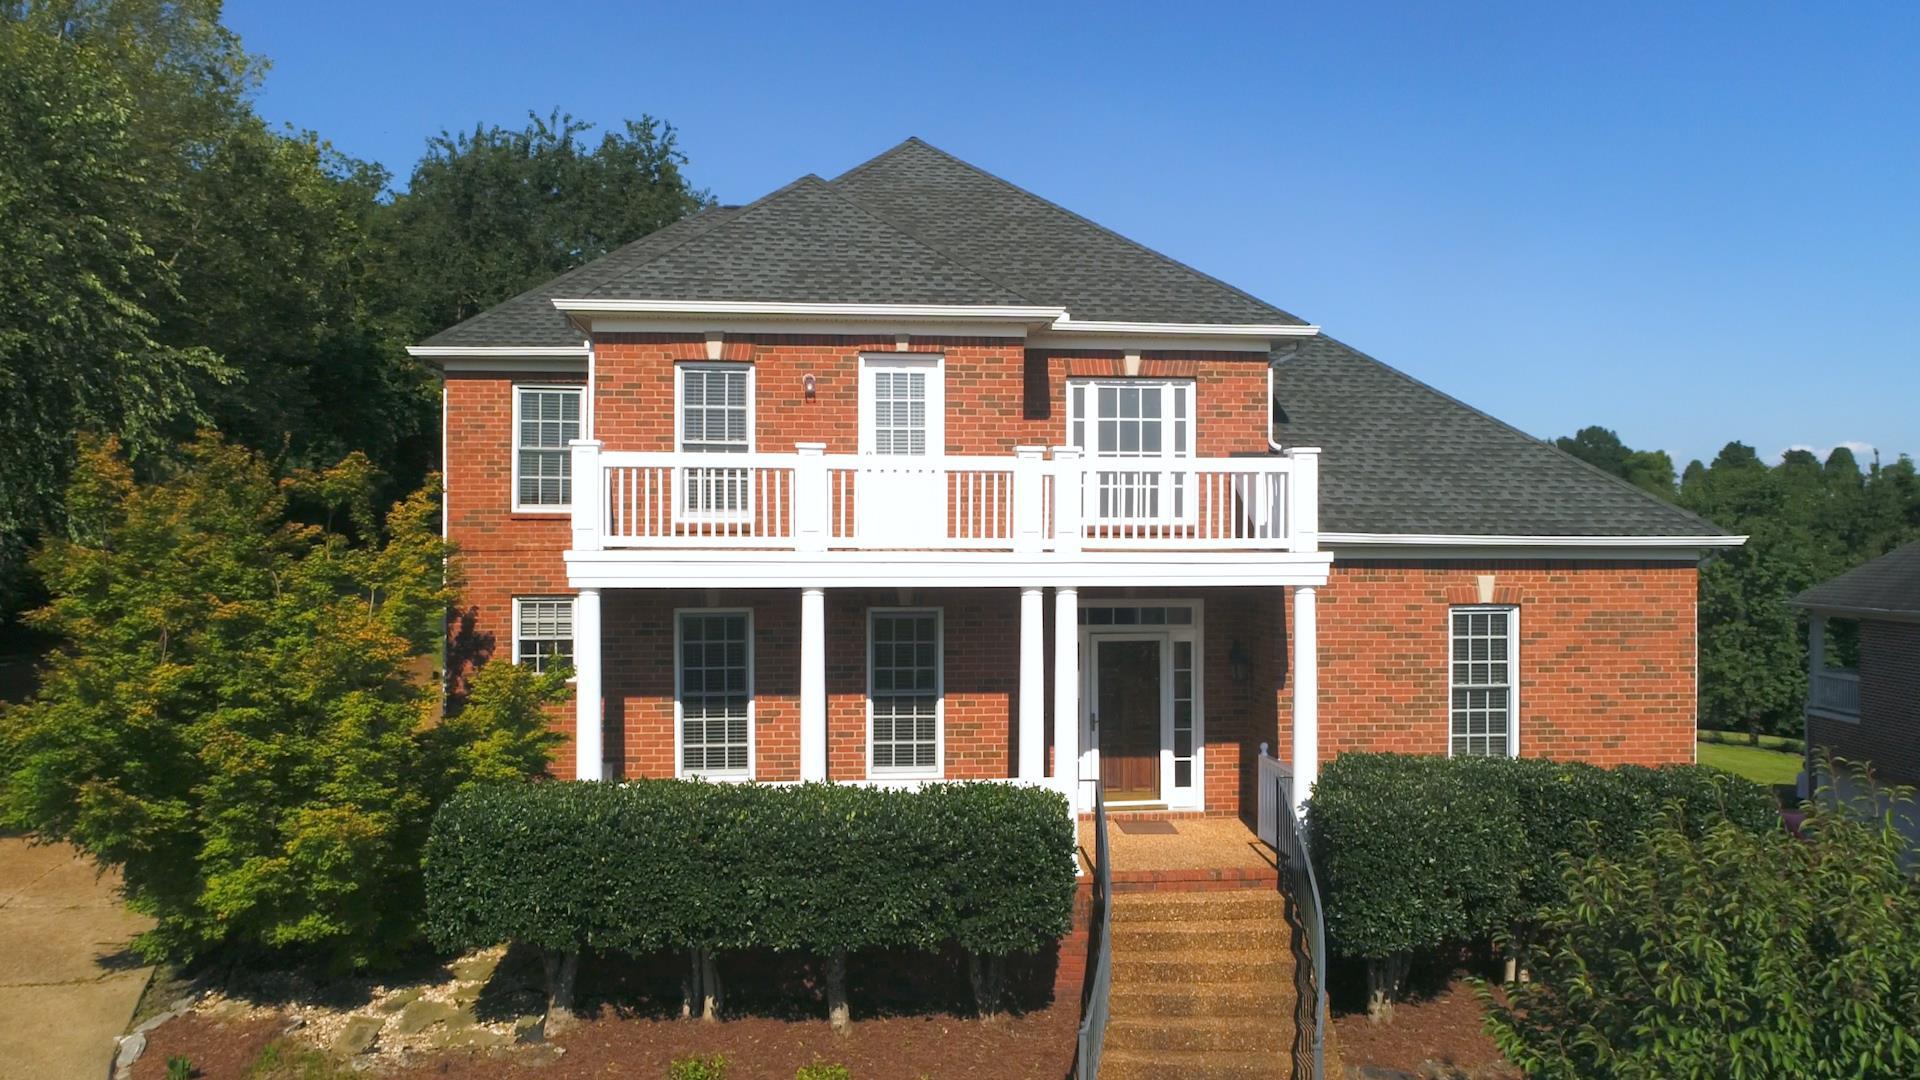 1248 Twelve Stones Xing, Goodlettsville, TN 37072 - Goodlettsville, TN real estate listing